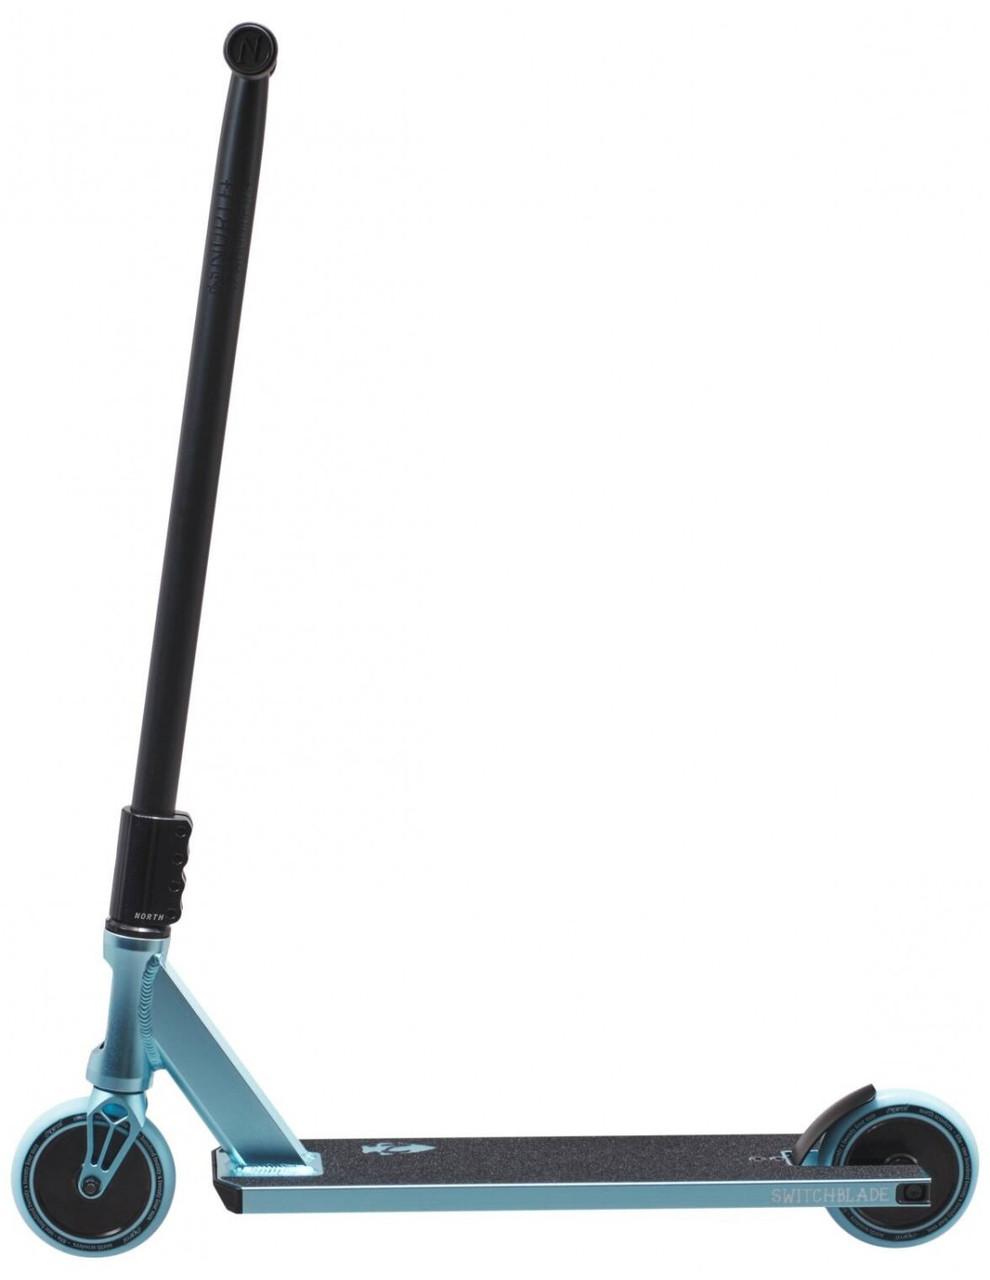 Трюковый самокат North Switchblade - Metallic Ice Blue & Matte Black